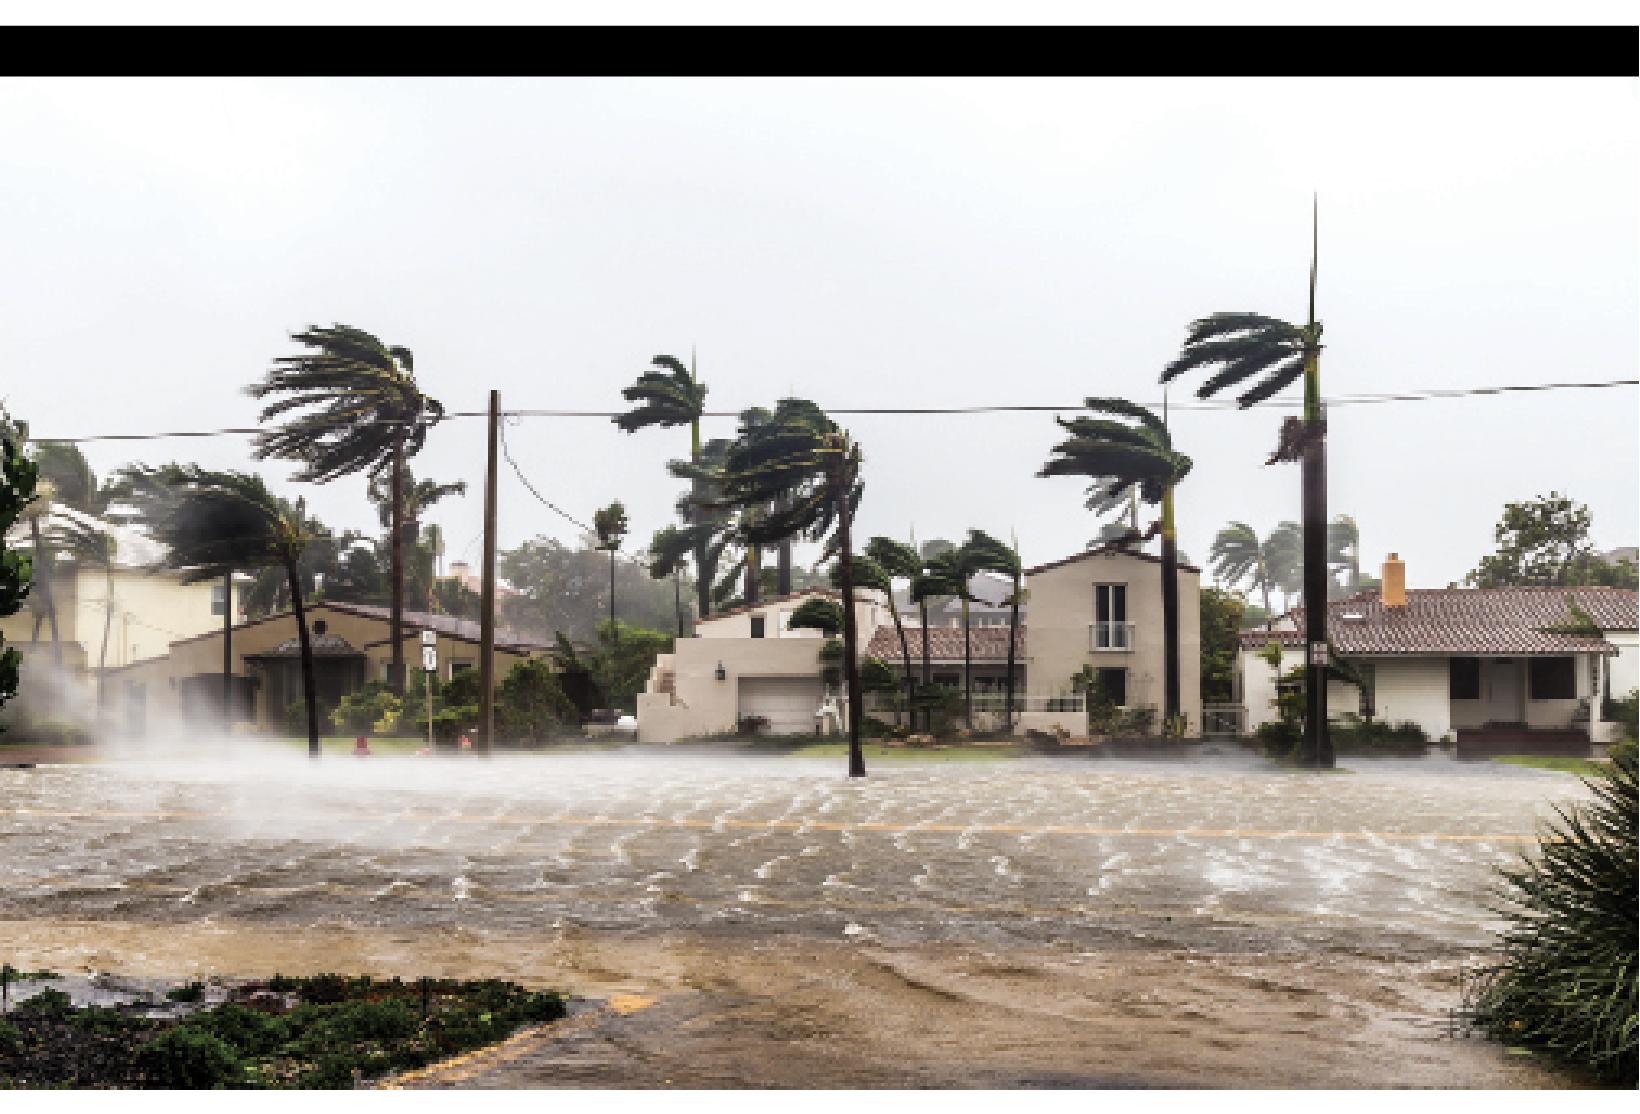 Inconvenient Irma Builder Magazine Hurricanes